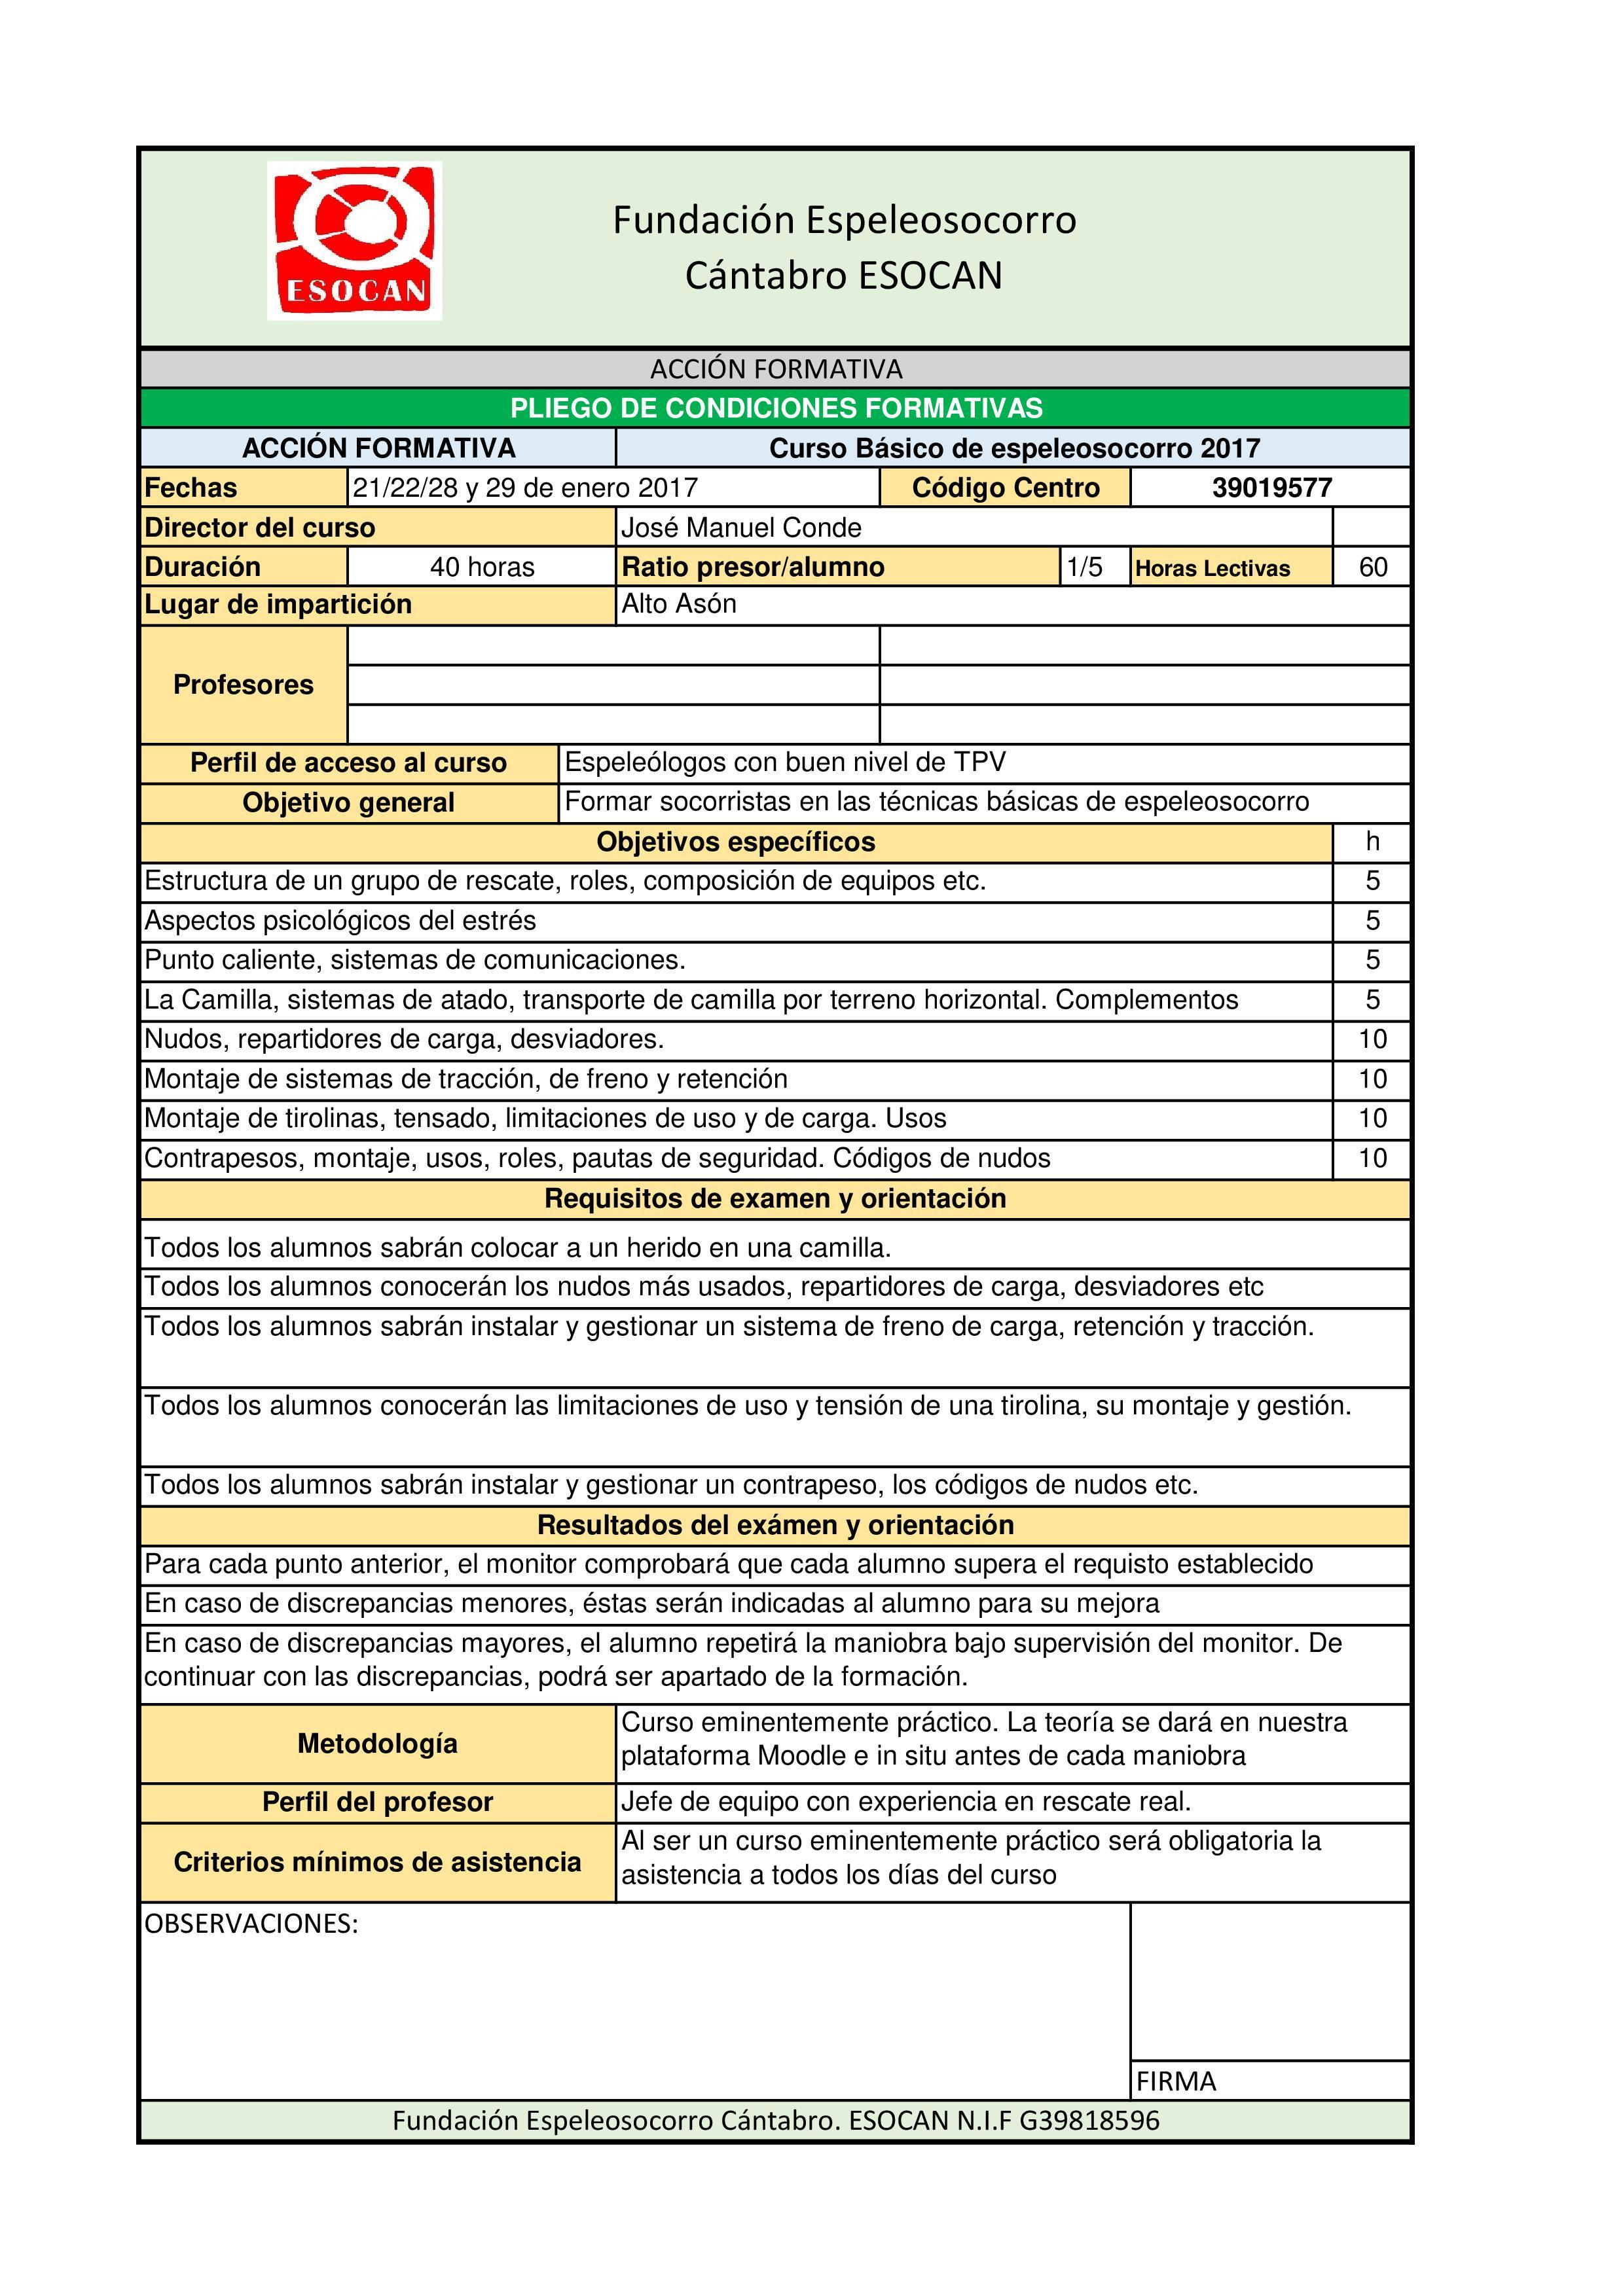 pliego-curso-basico-espeleosocorro-2017